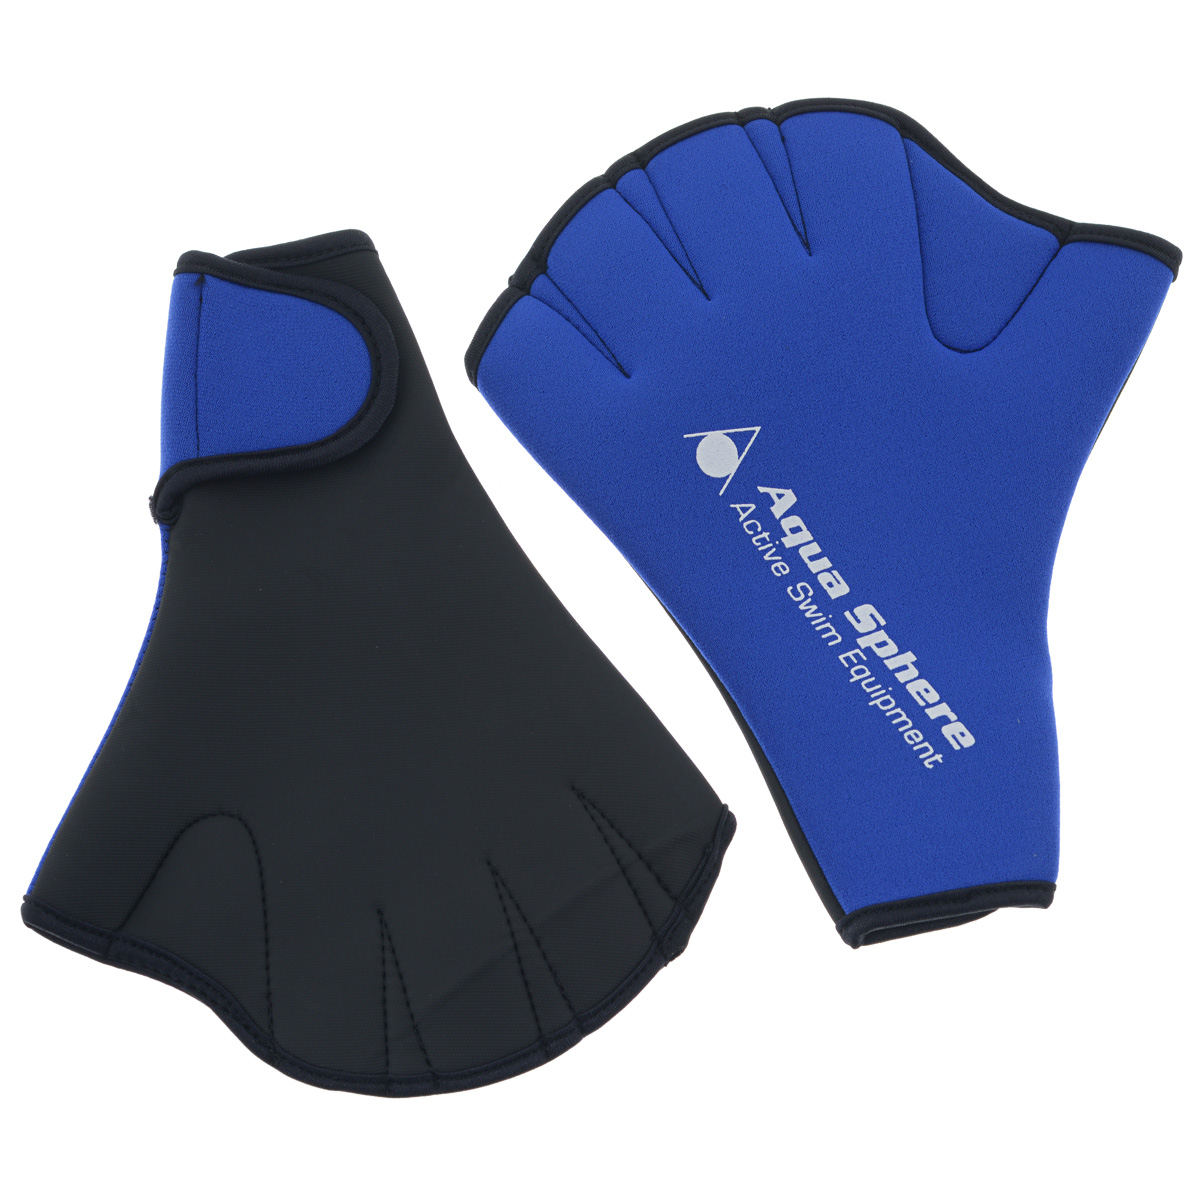 Перчатки для рук Aqua Sphere Swim Glove, цвет: синий. Размер L aqua sphere racing tube green прозрачный силикон